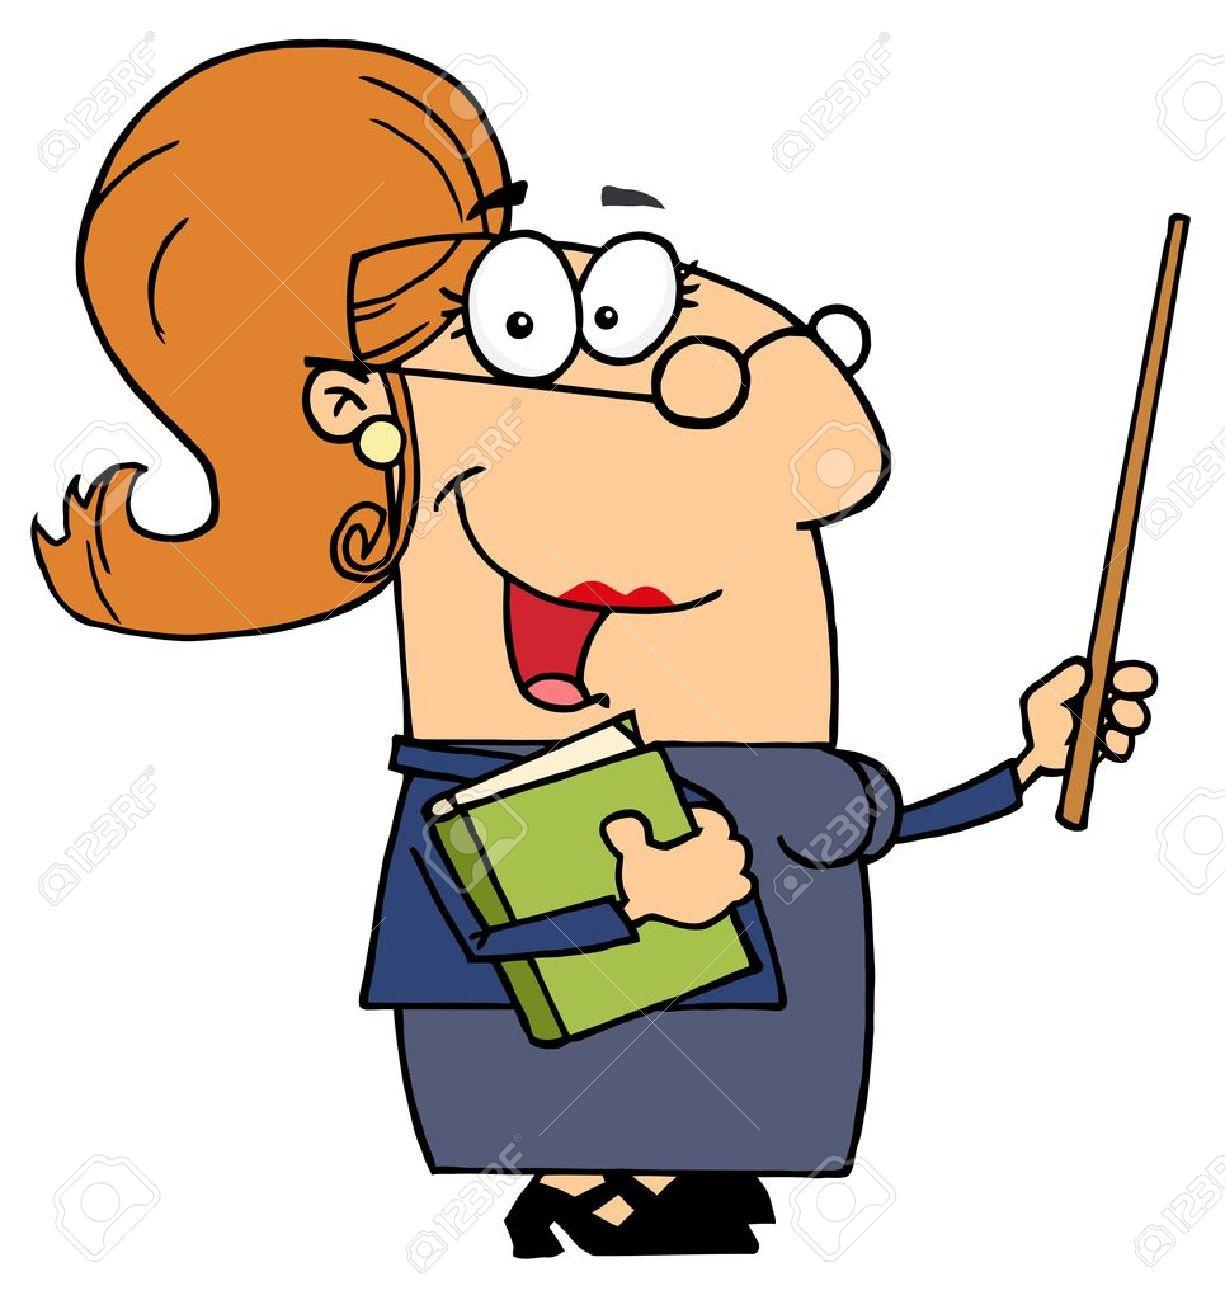 Female Professor Clipart #1. female prof-Female Professor Clipart #1. female professor: Professor .-3